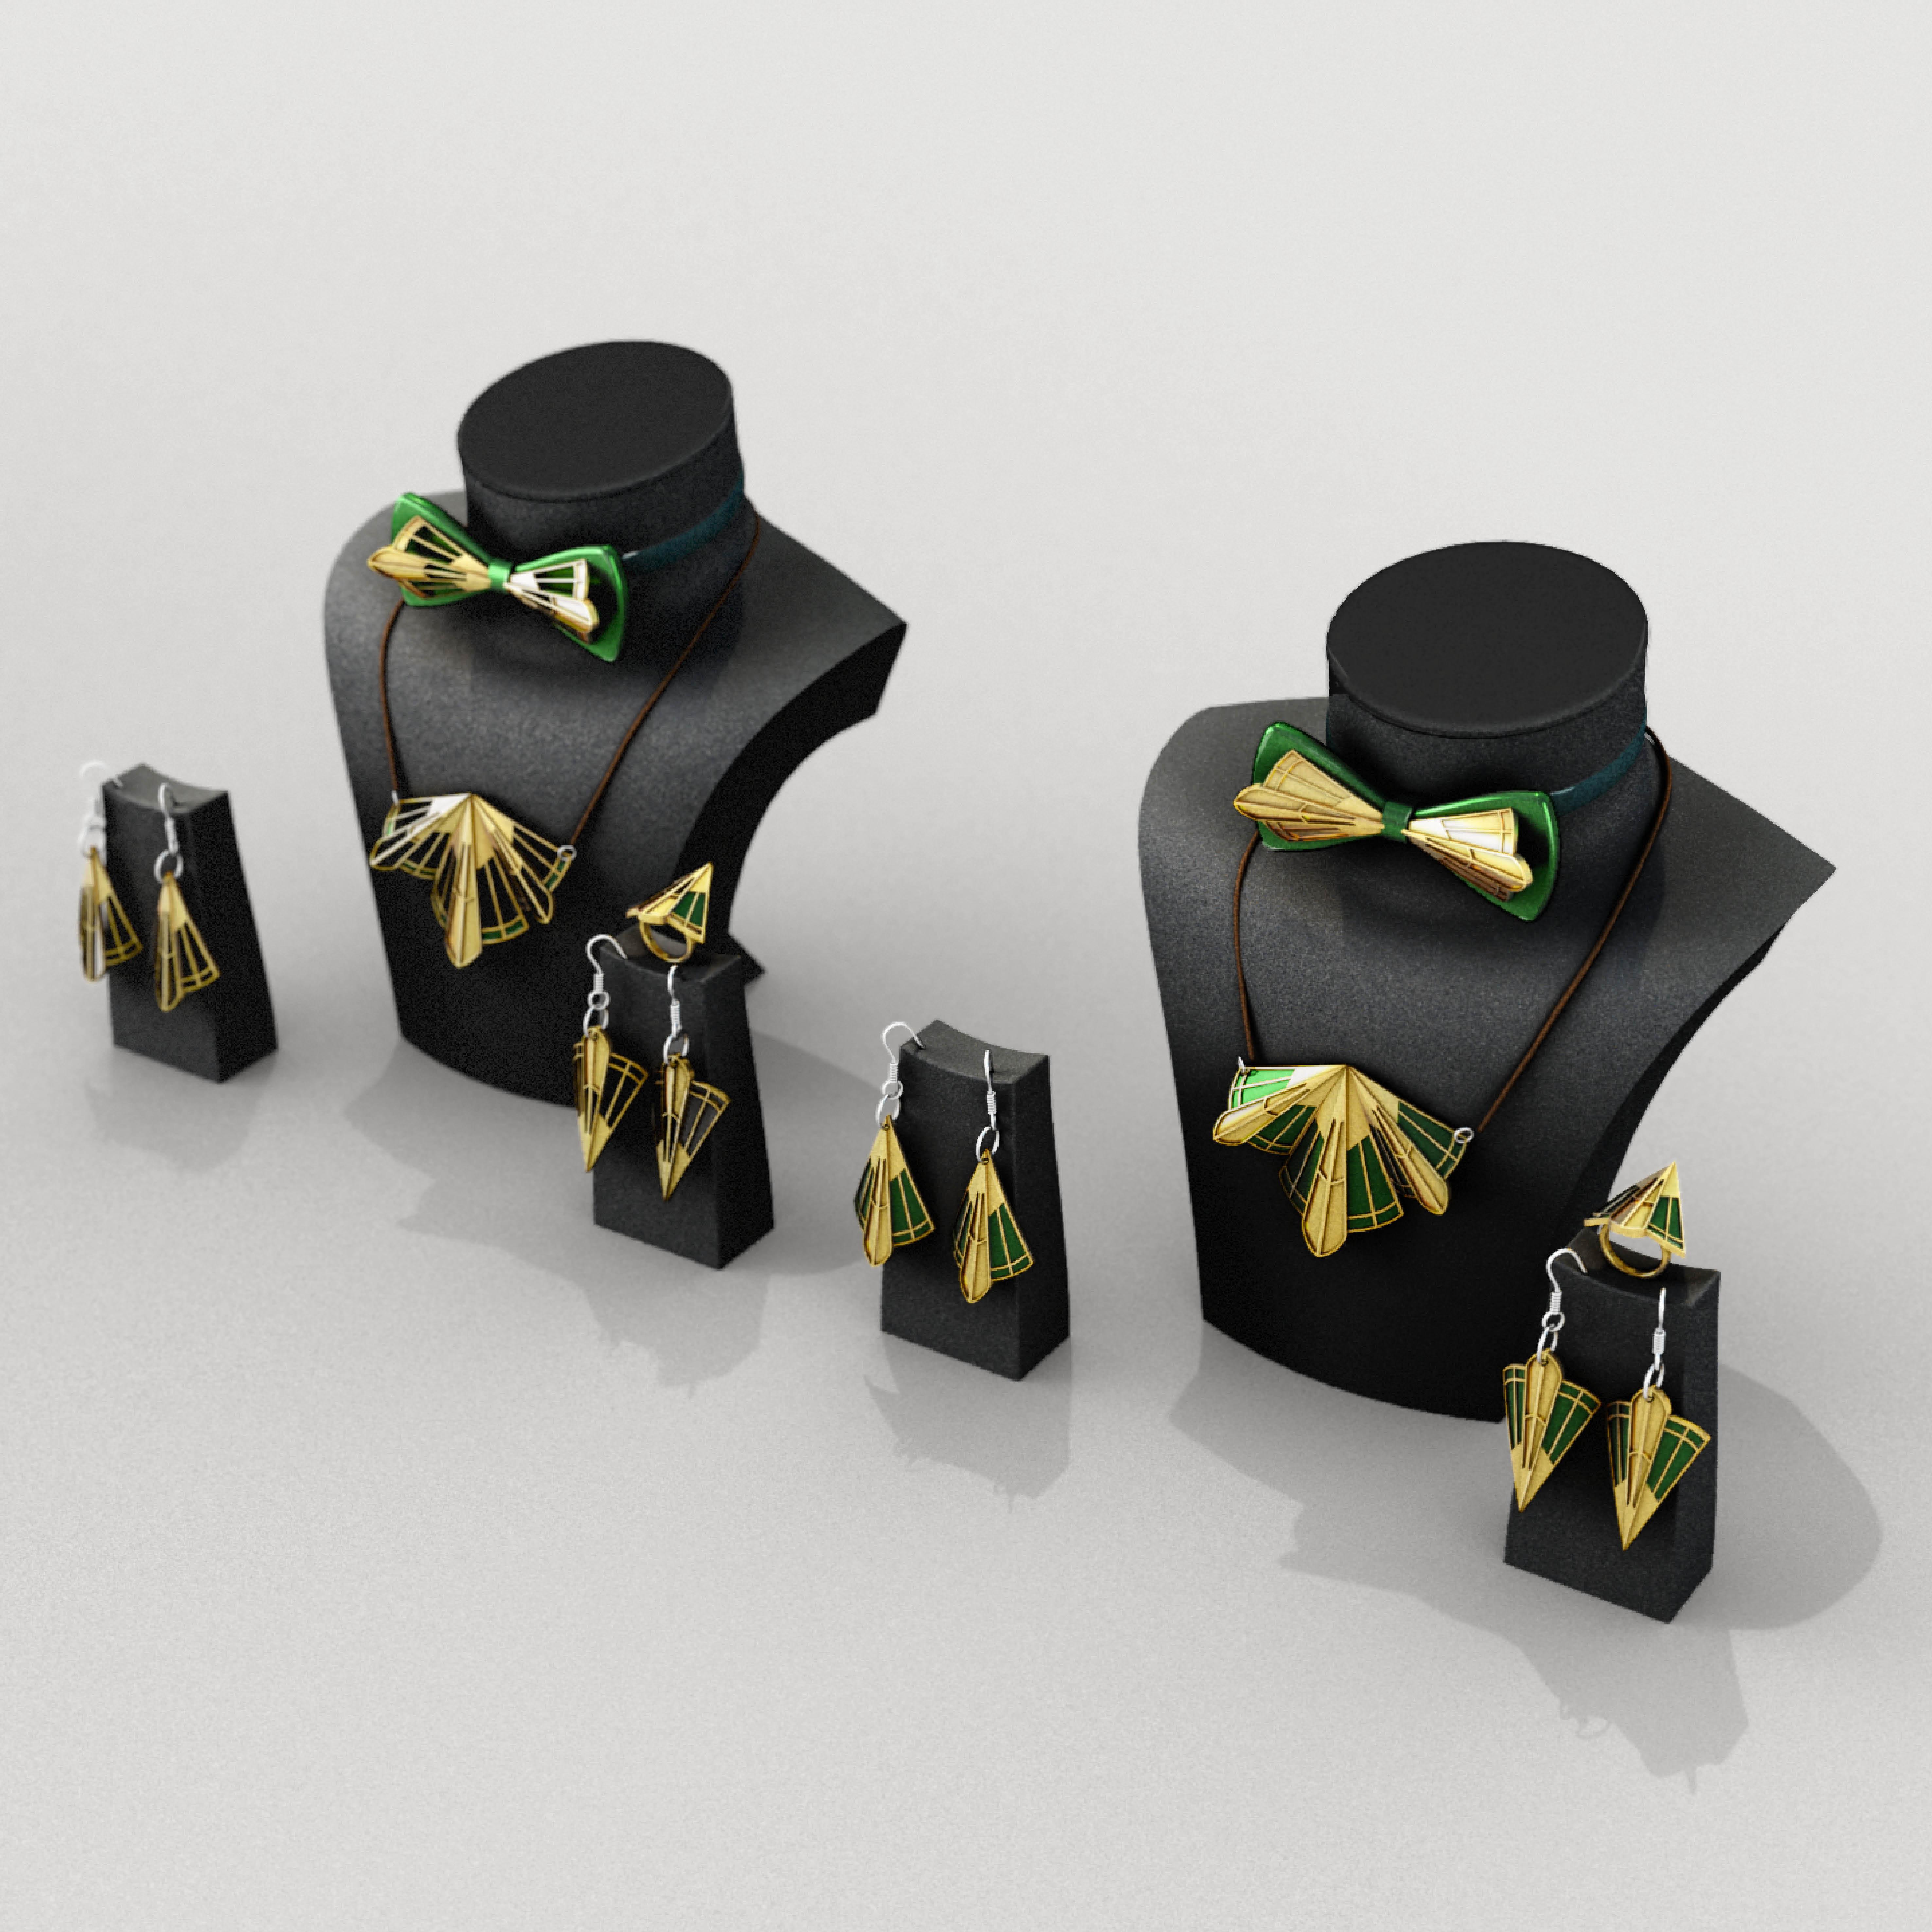 Sin título-1.jpg Download free STL file bijoux decoeur nº1 • 3D printable model, ArtViche